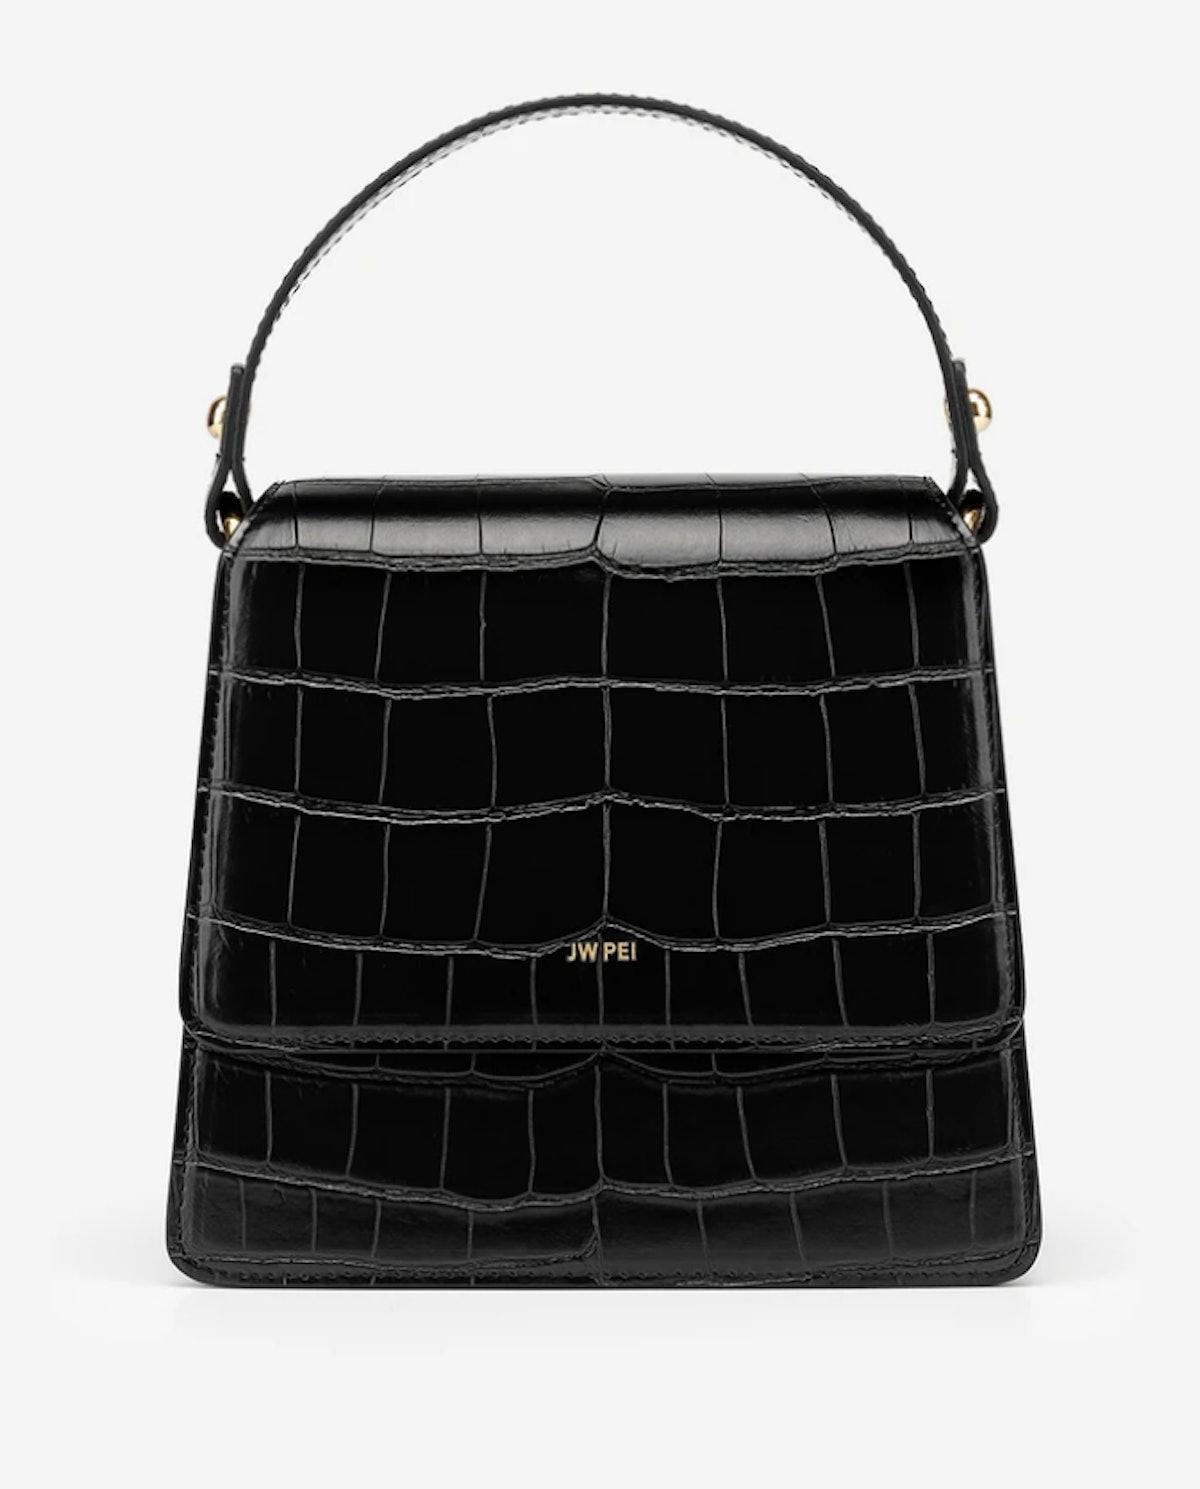 JW PEI's The Fae Top Handle bag in black croc.